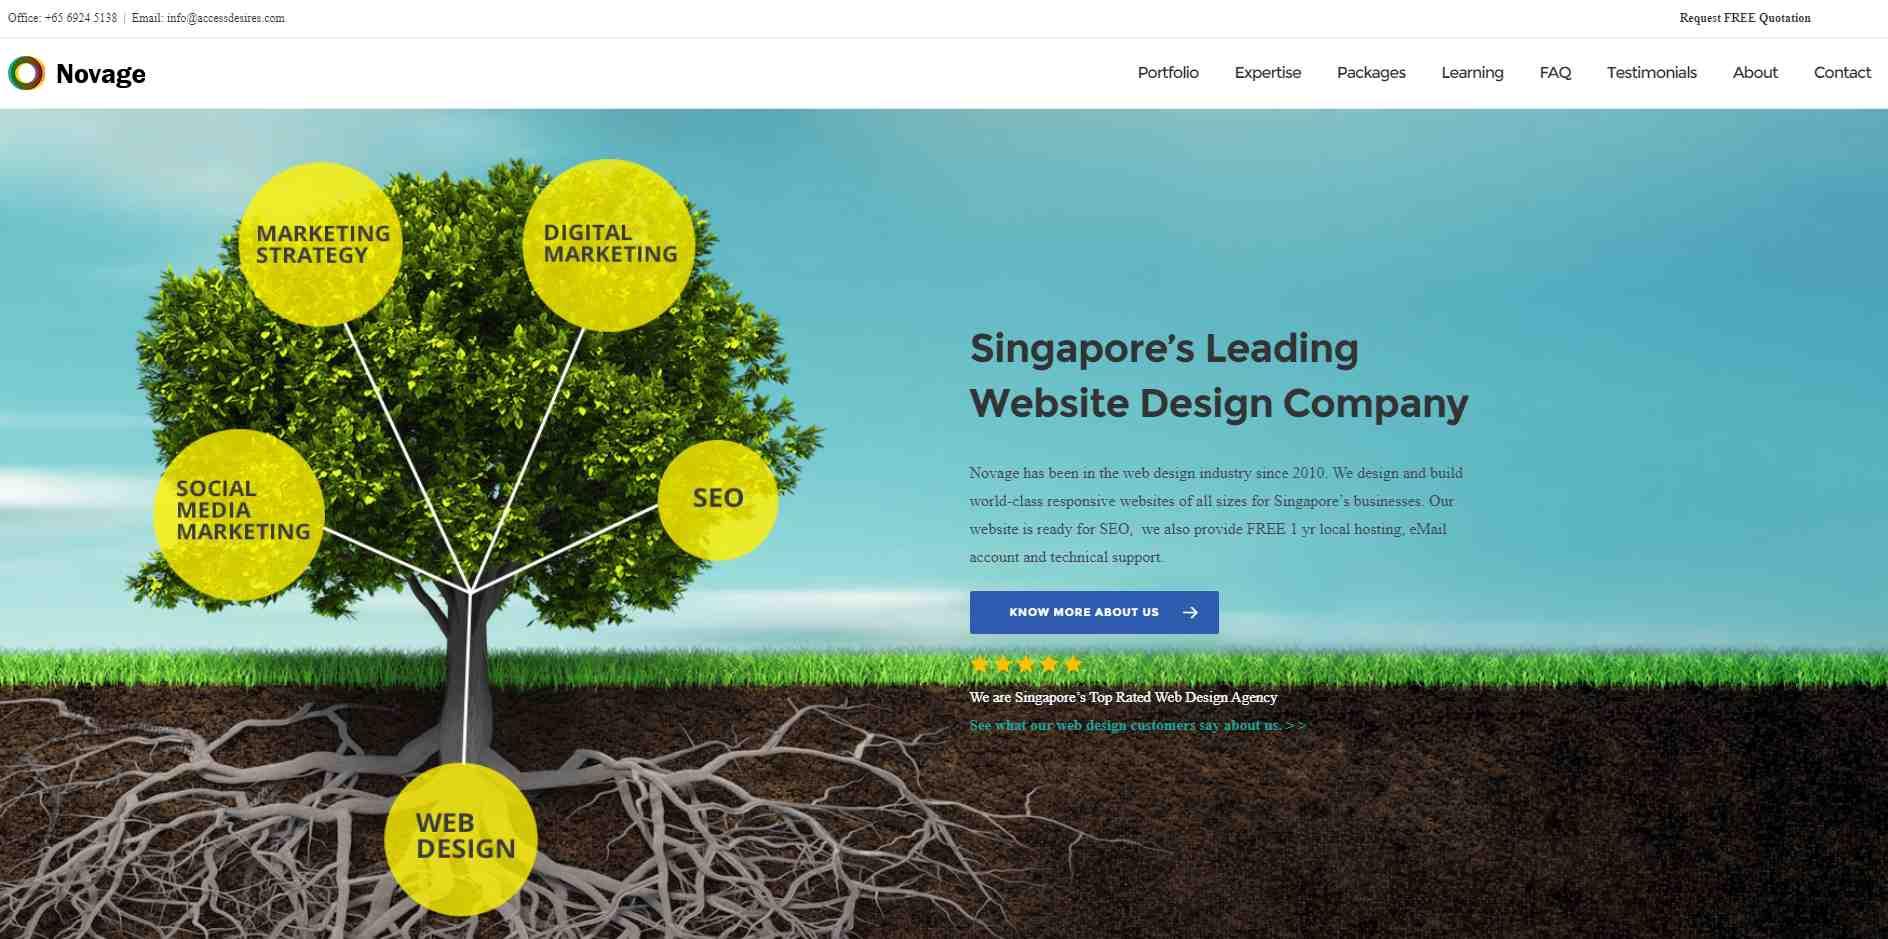 novage Should I Go for a Cheap Website Design in Singapore